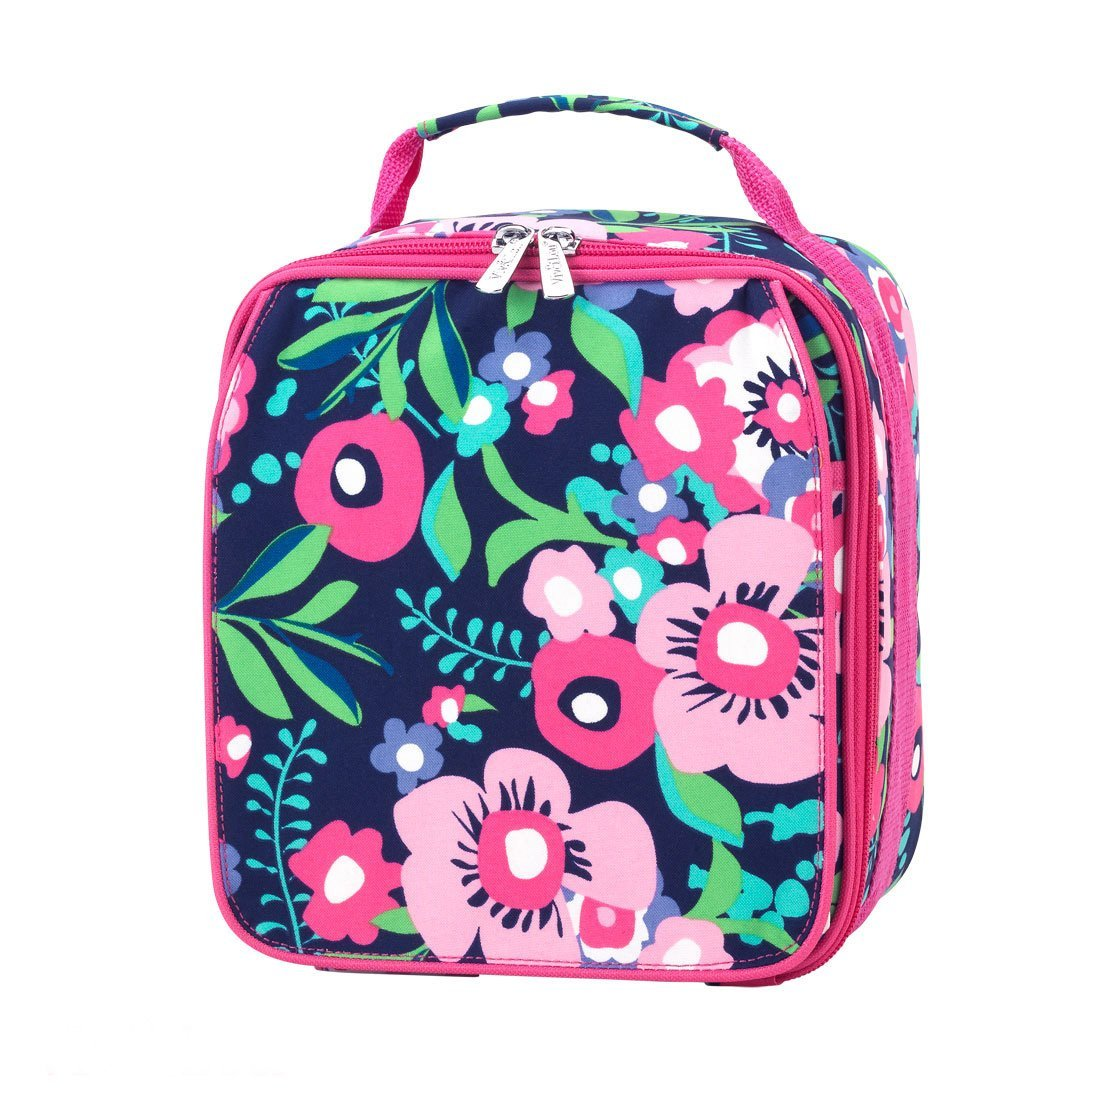 Personalized Posie Backpack Backpack Back To school Backpacks for Girls Monogrammed Backpacks For Girls